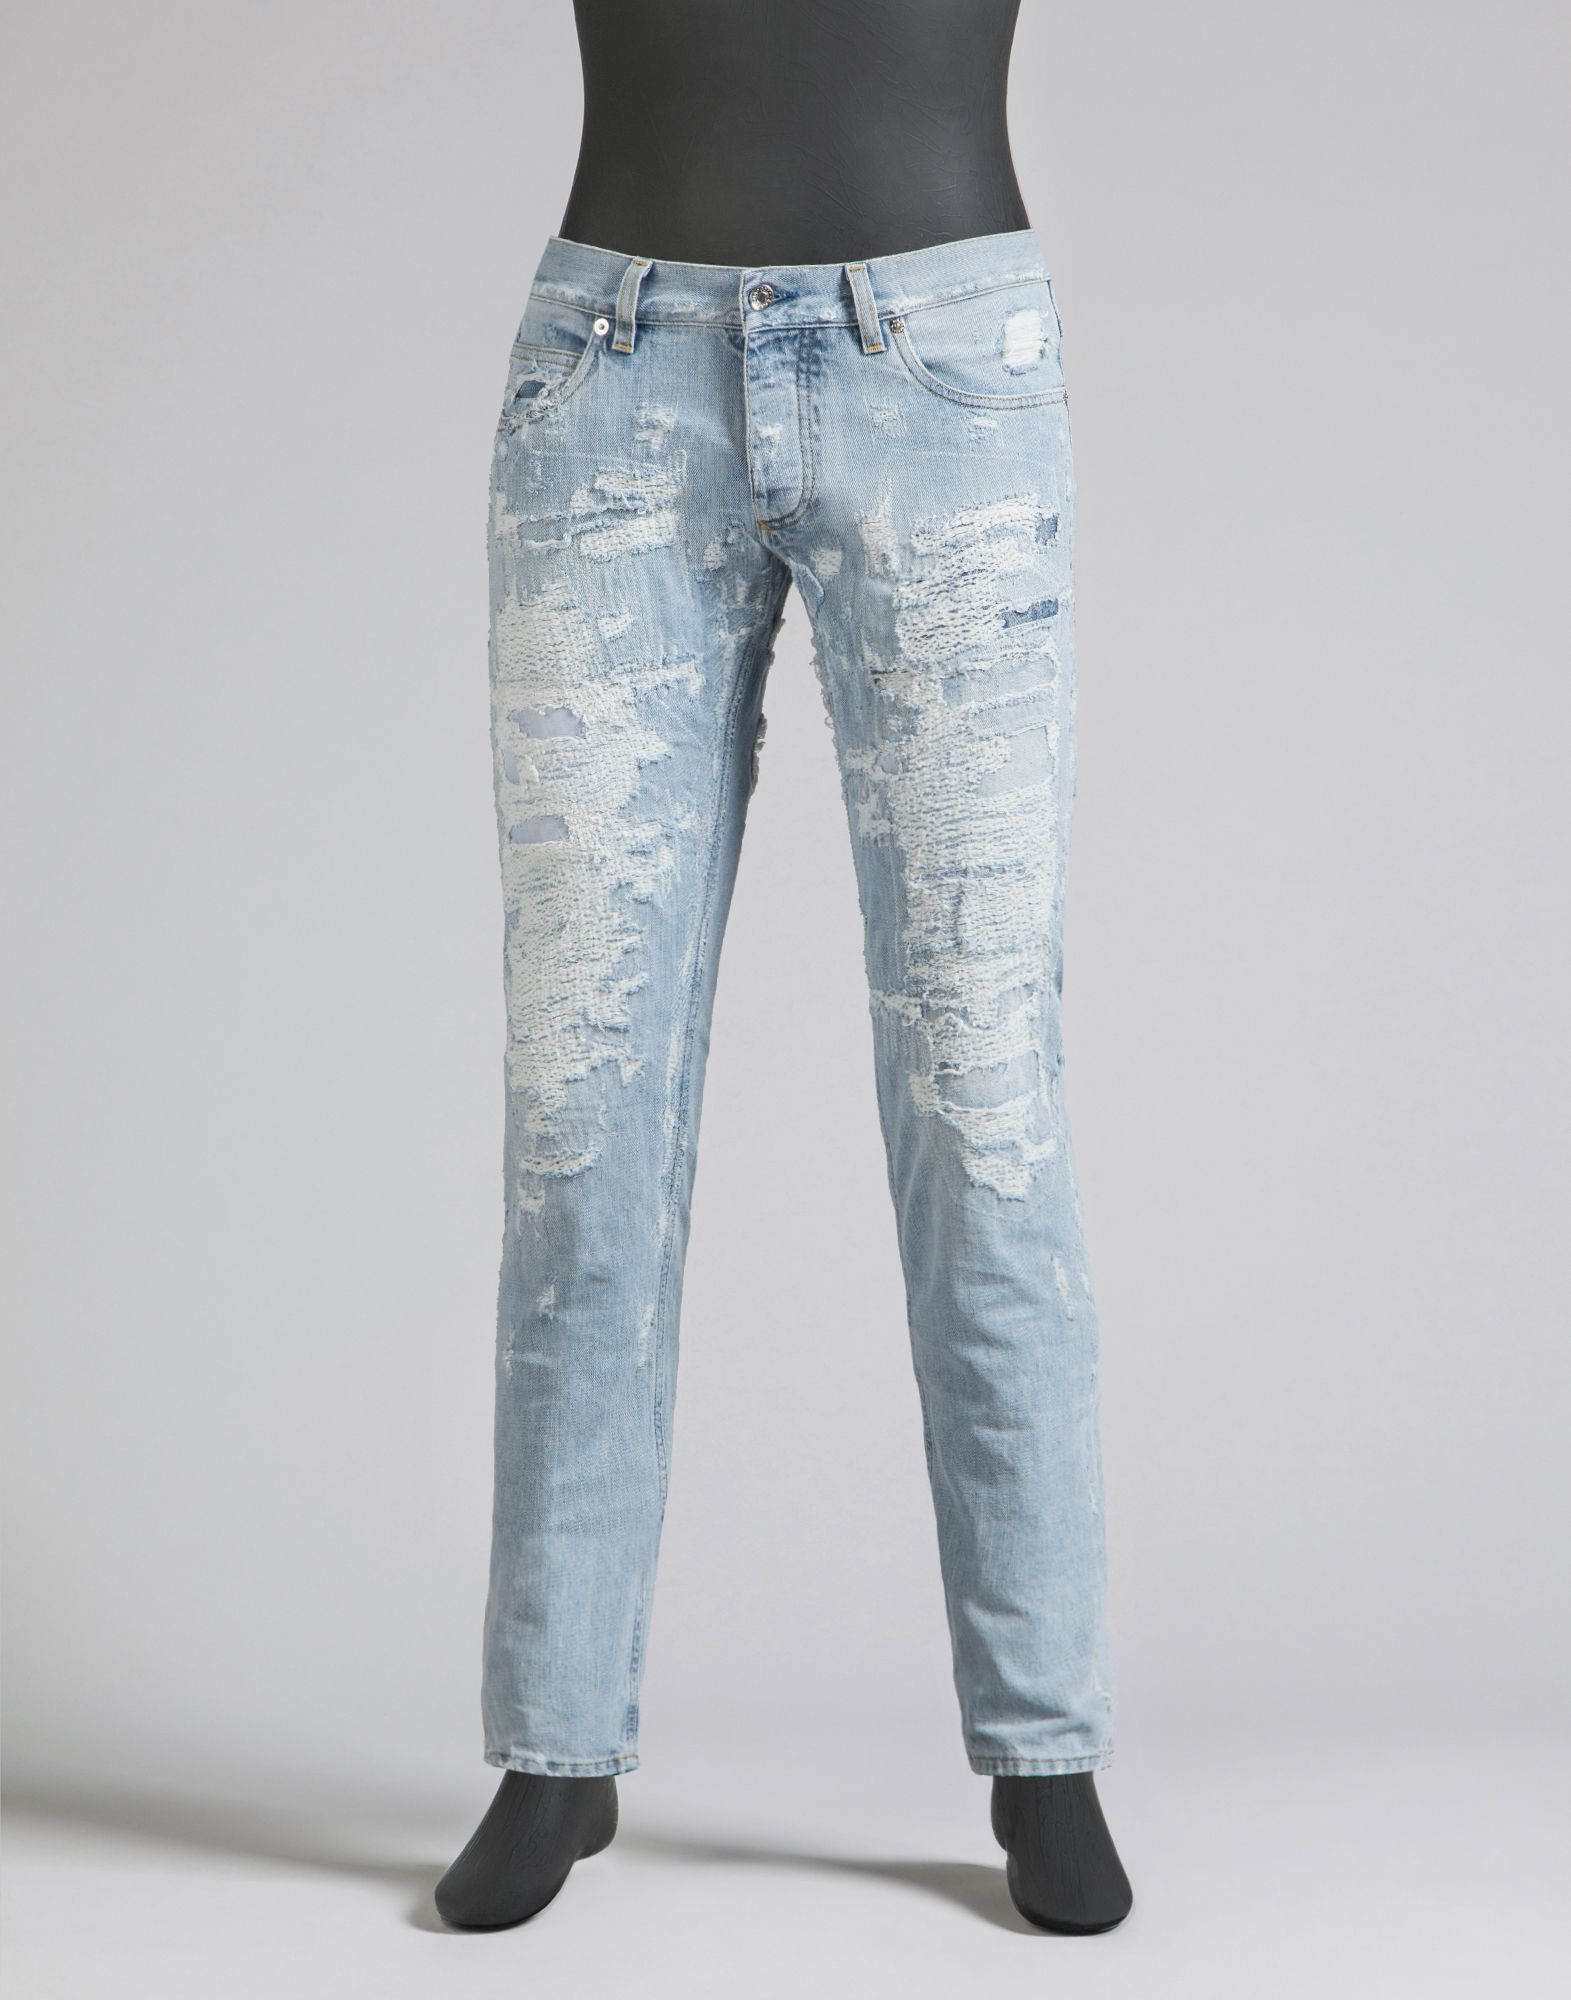 Skinny jeans Dolce & Gabbana 2X1Pu3tMhg